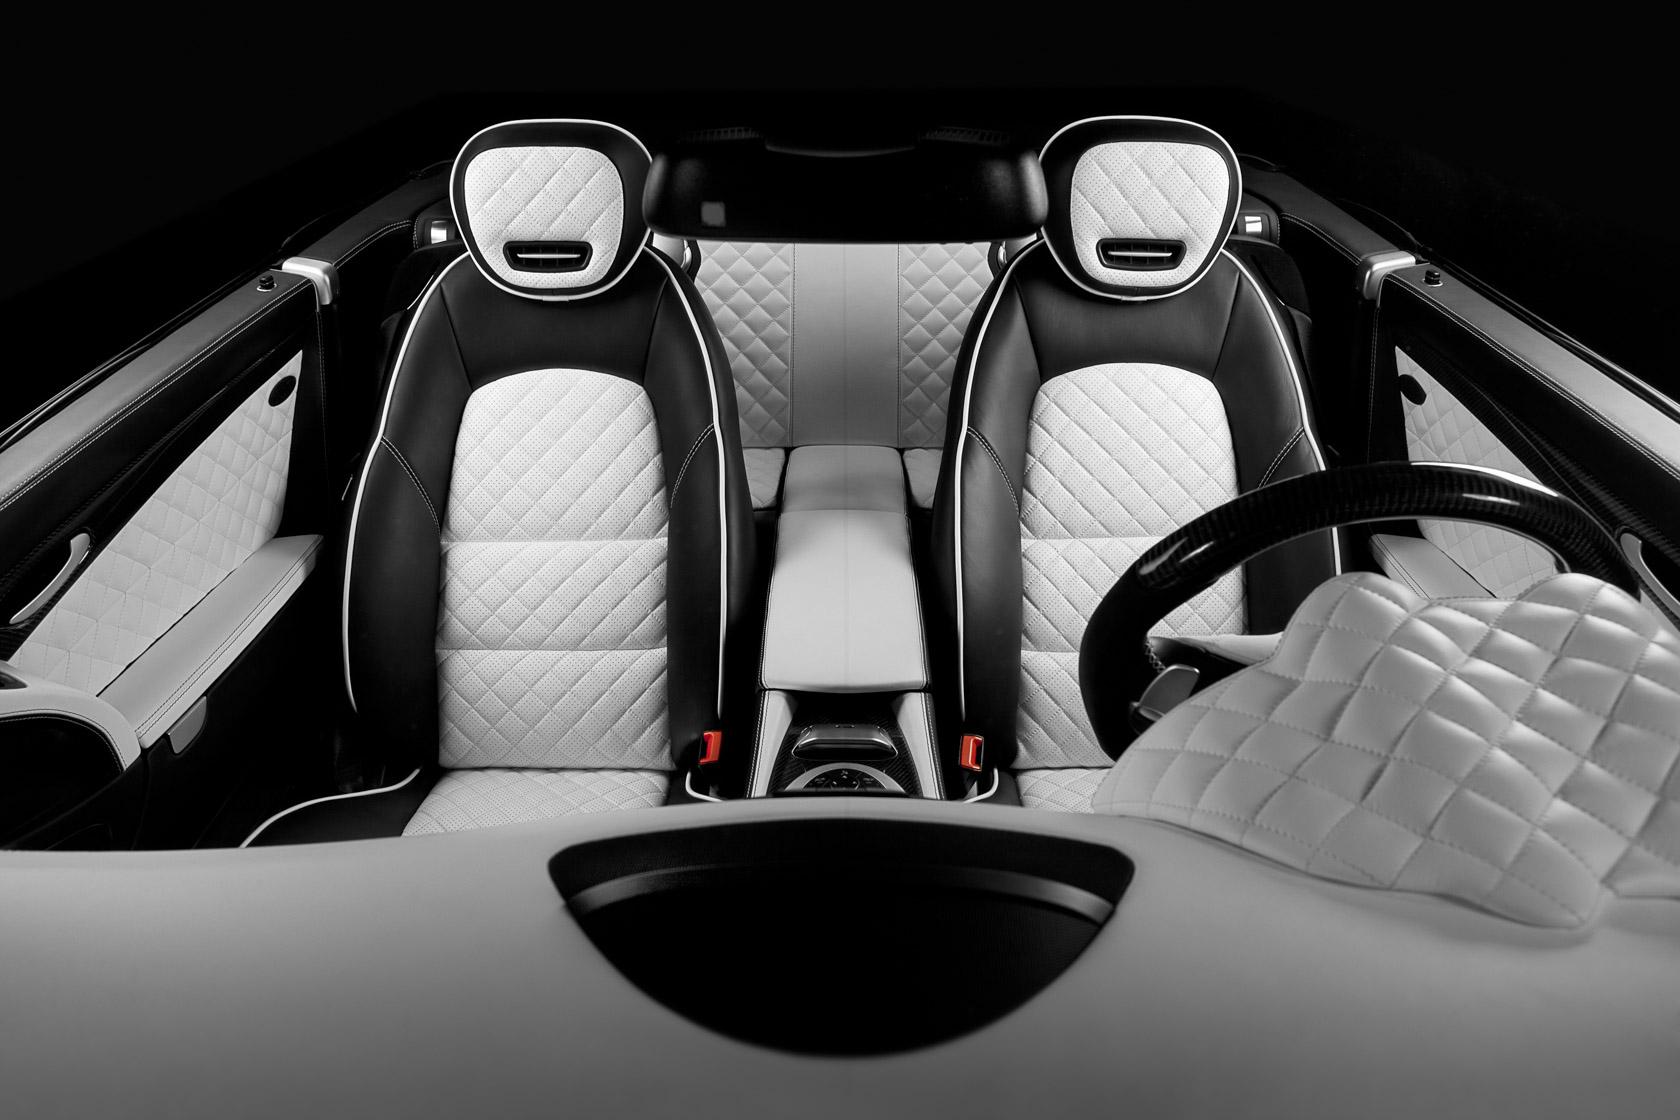 Mercedes Range Rover Interior Design, Front View